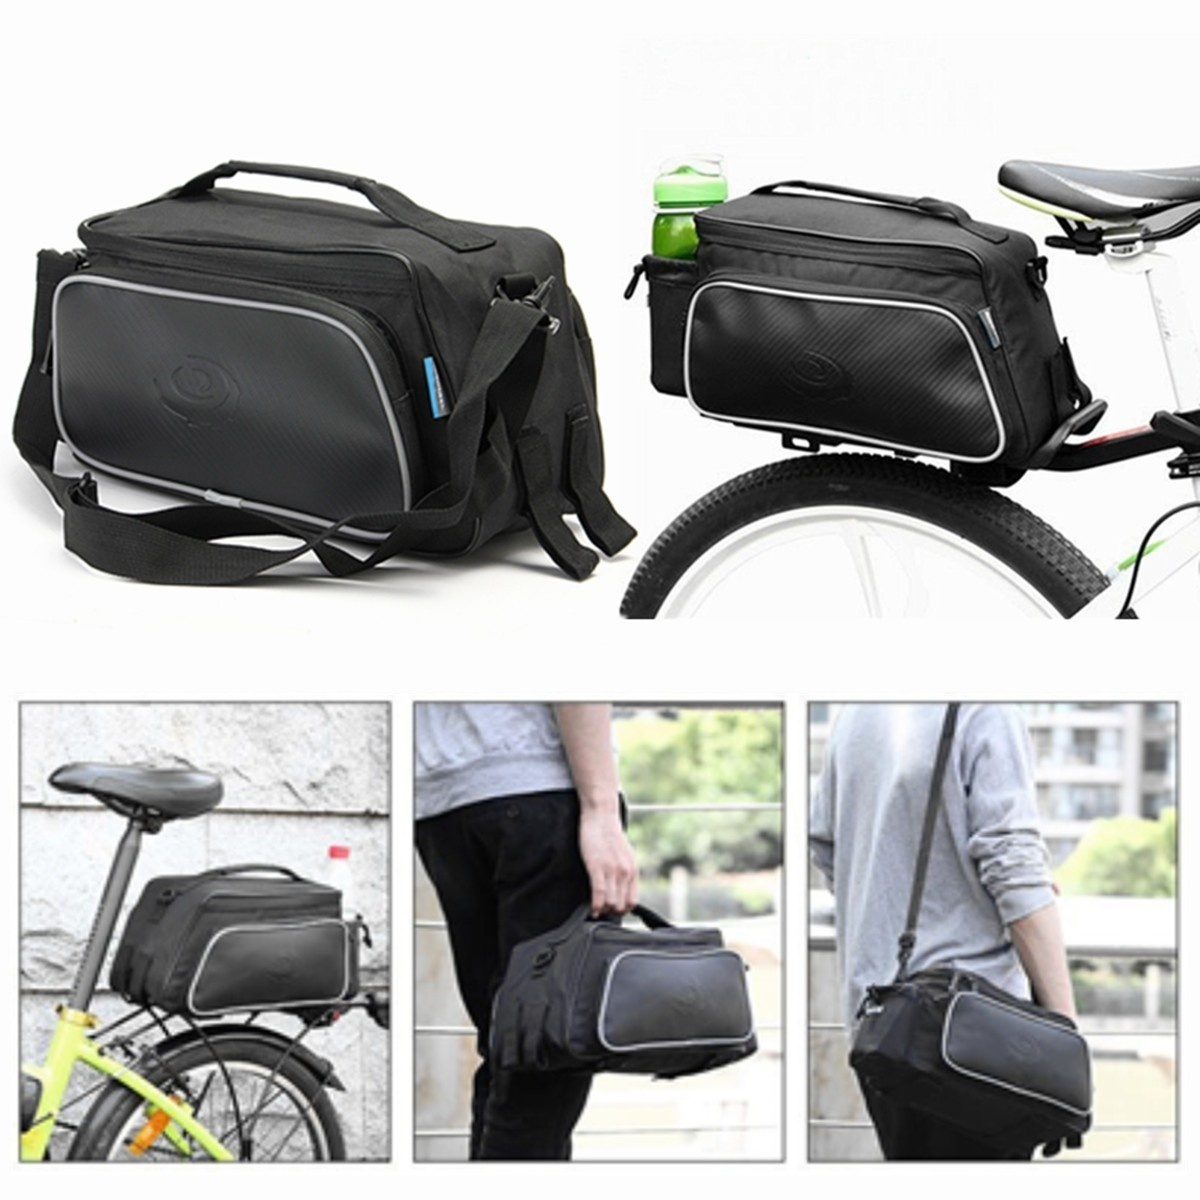 Roswheel Bicycle Bike Rear Tail Seat Pannier Bag Pouch Trunk Rack Shoulder Black